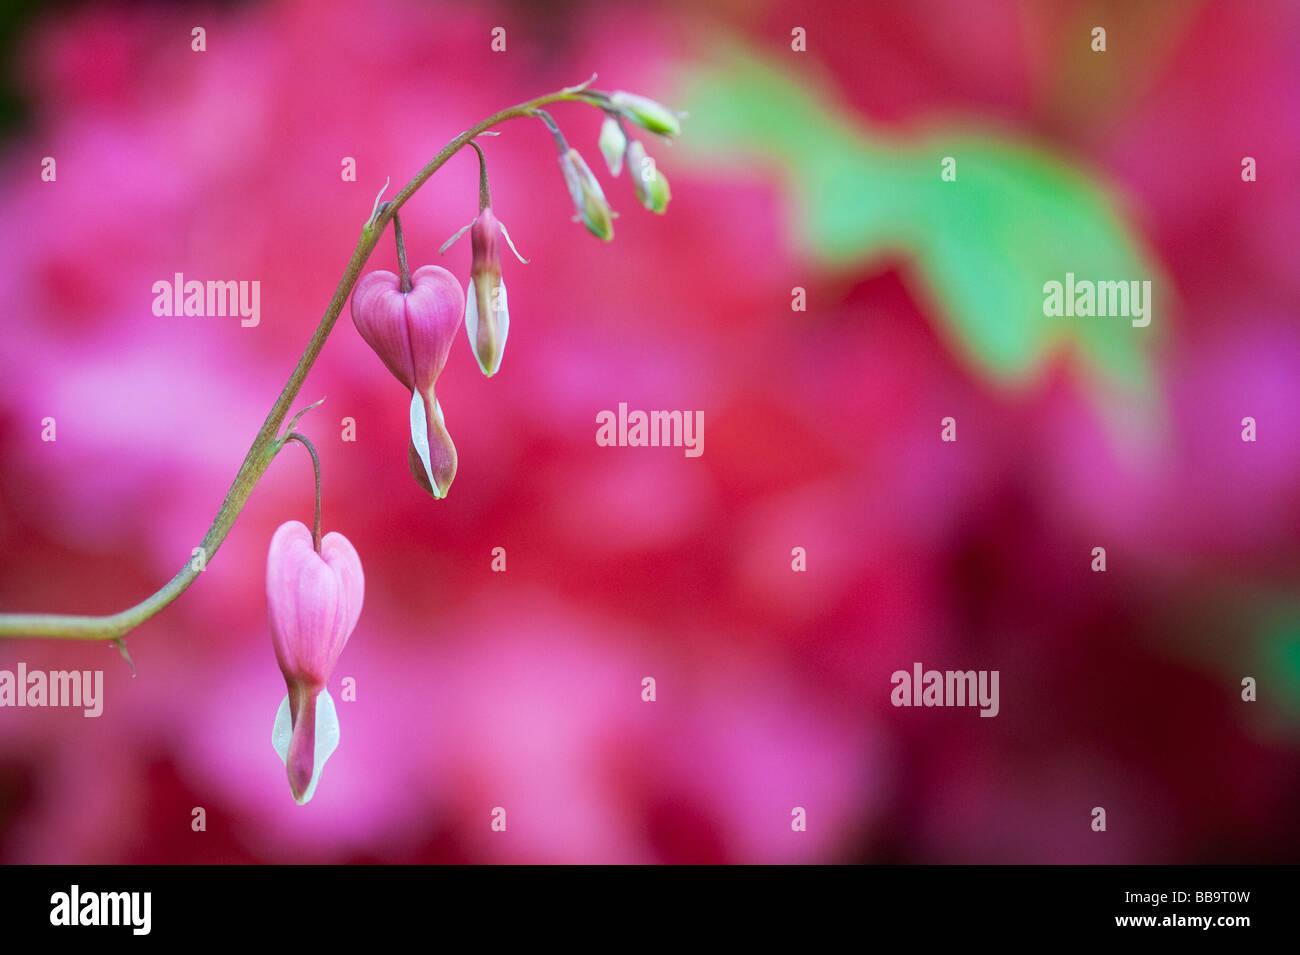 Lamprocapnos spectabilis. Bleeding heart flowers - Stock Image